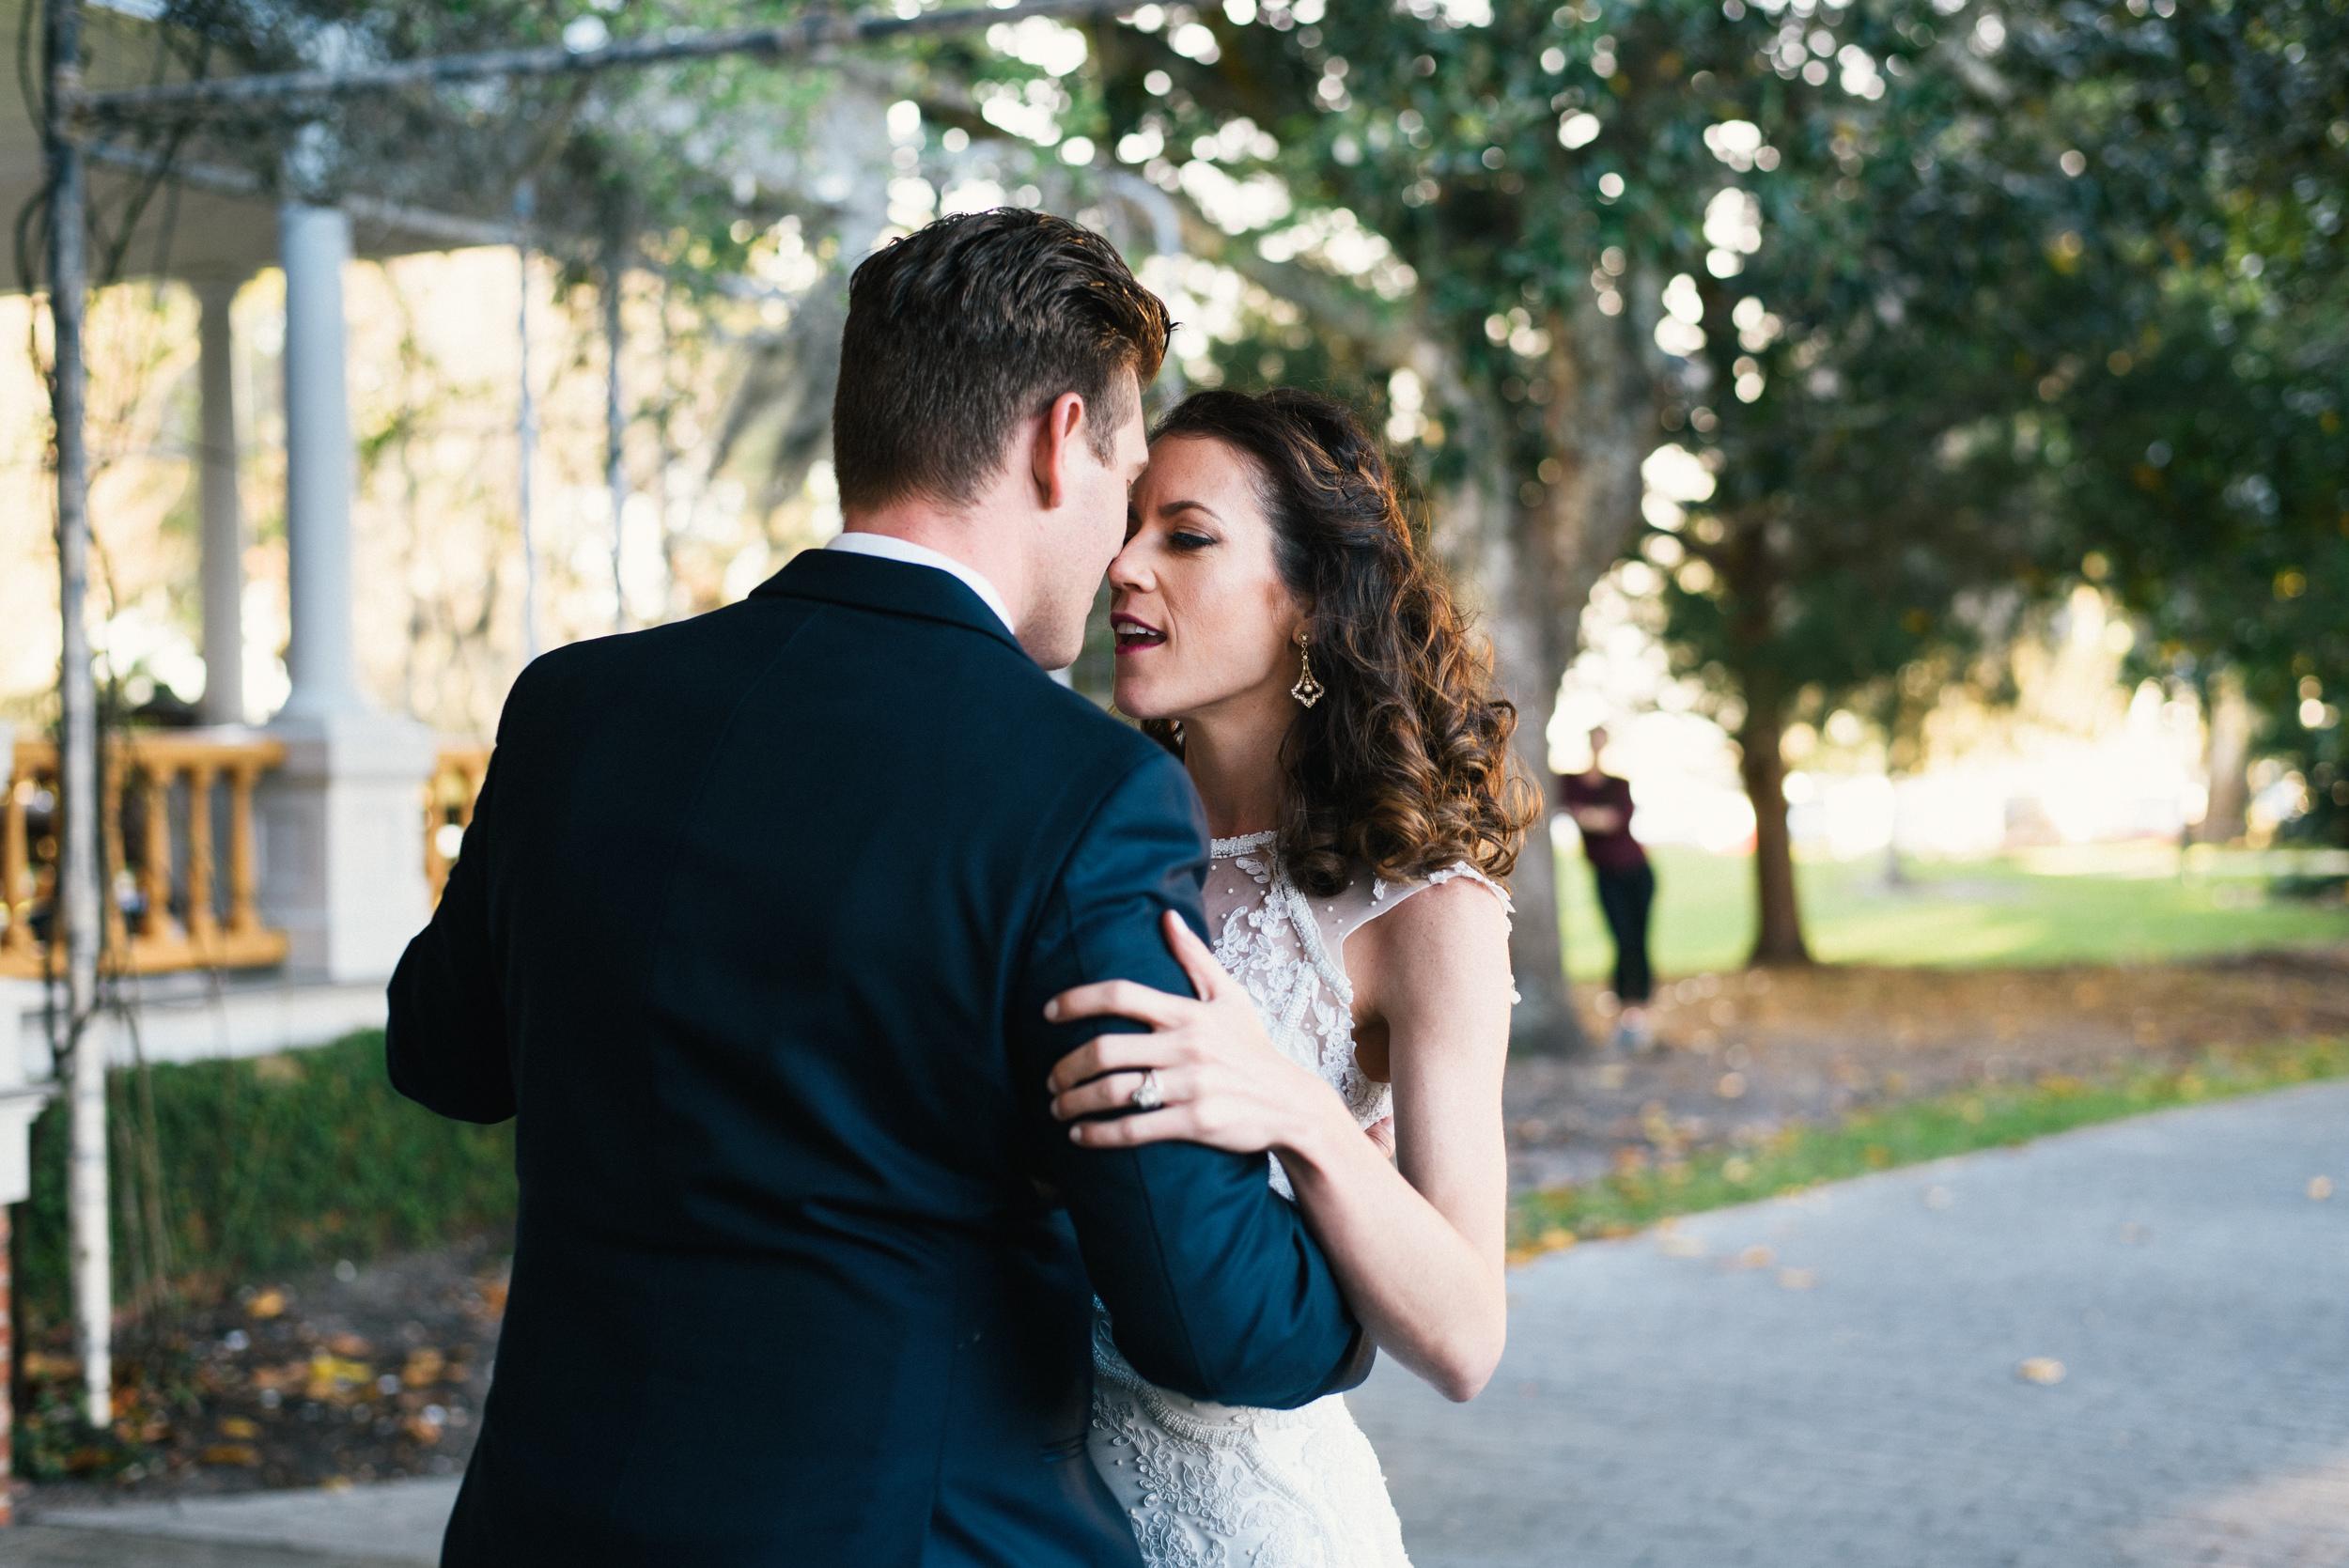 kadi-and-matt-carroll-april-9-2016-jekyl-island-wedding-m-newsom-photography- (331 of 484).jpg